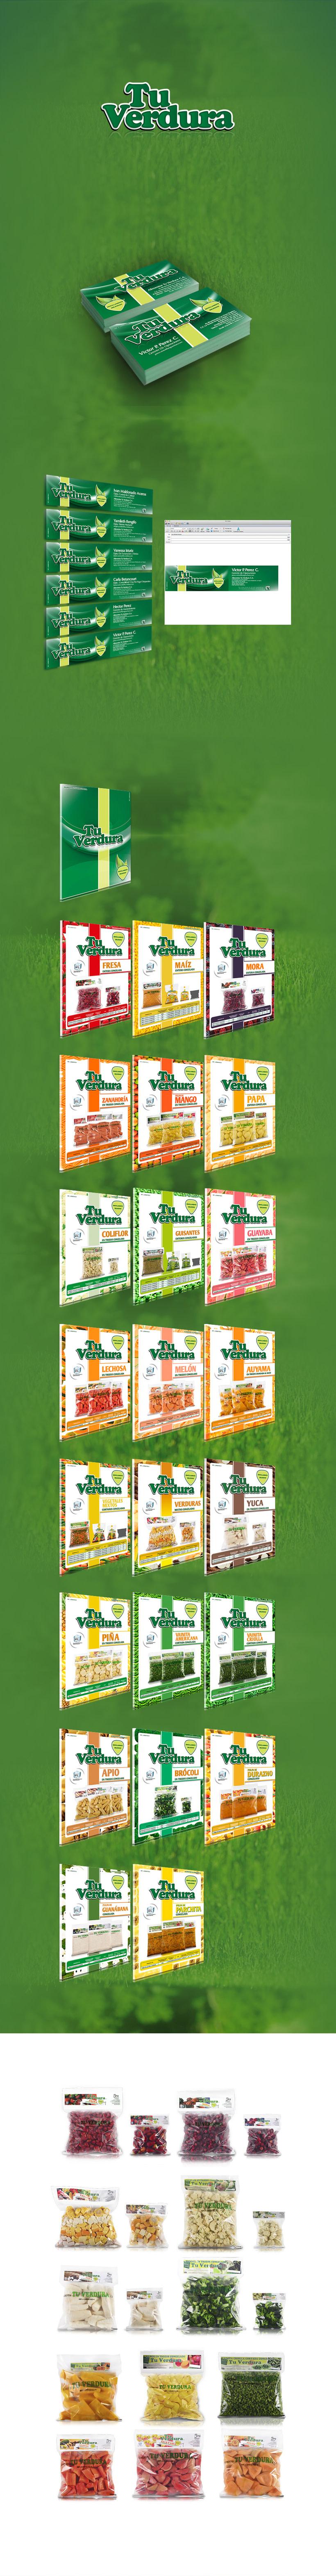 Diseños Alimentos Tu Verdura 1